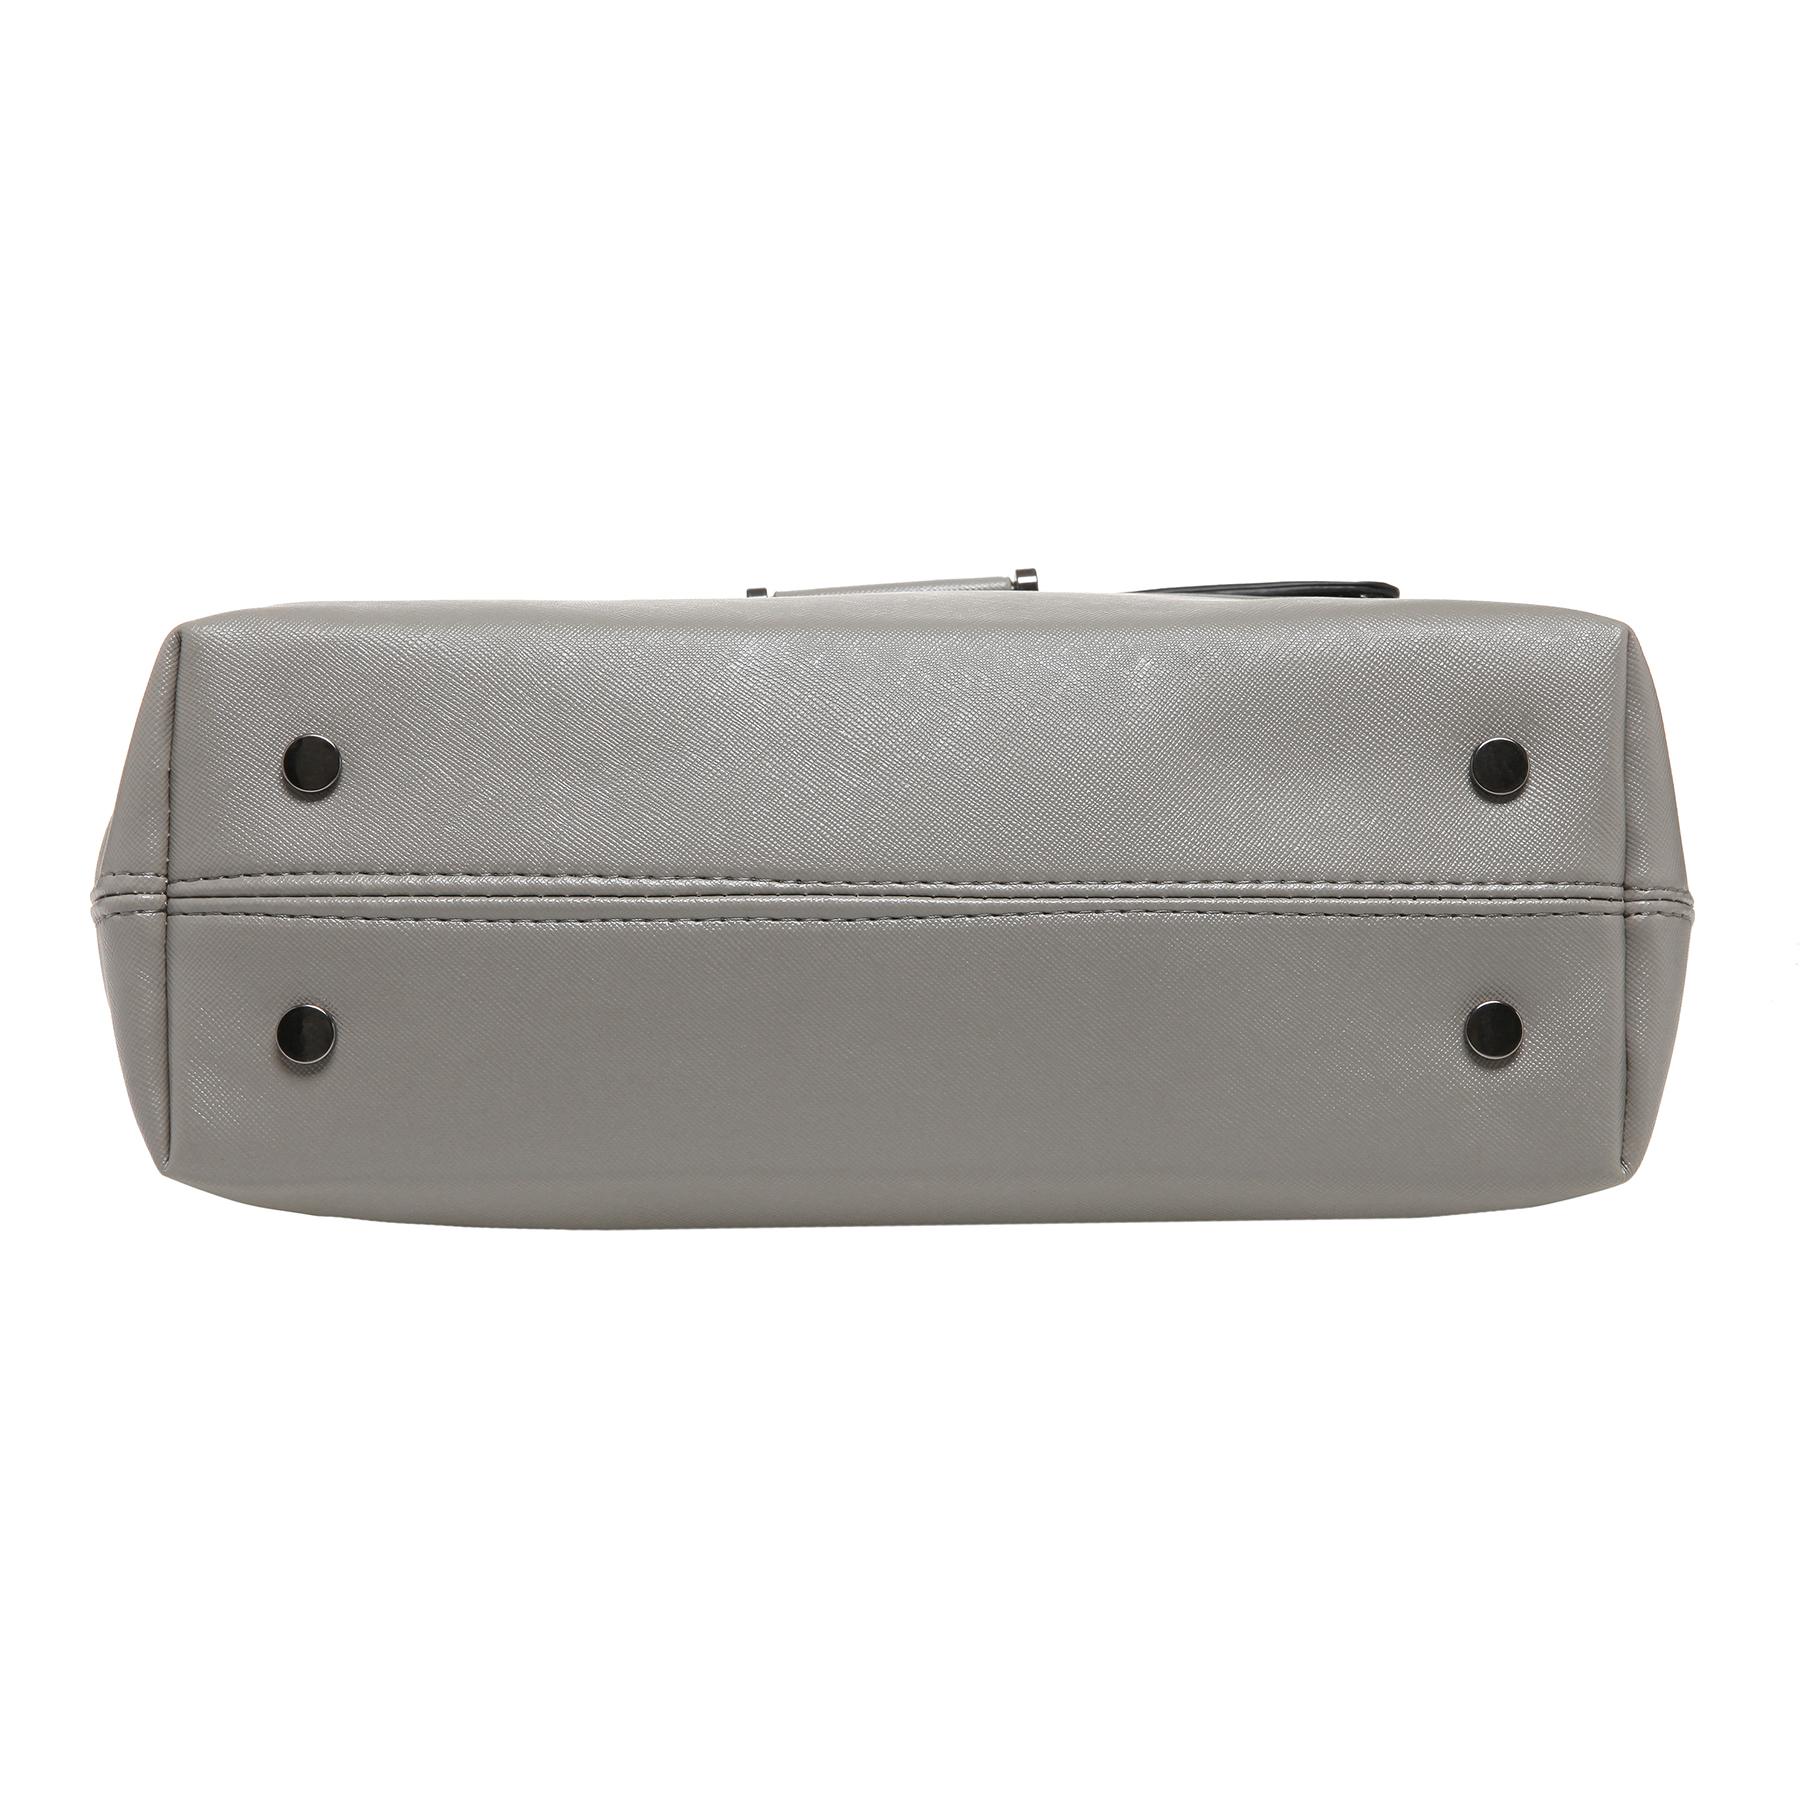 mg-collection-meryl-top-handle-tote-handbag-tb-h0651blk-6.jpg